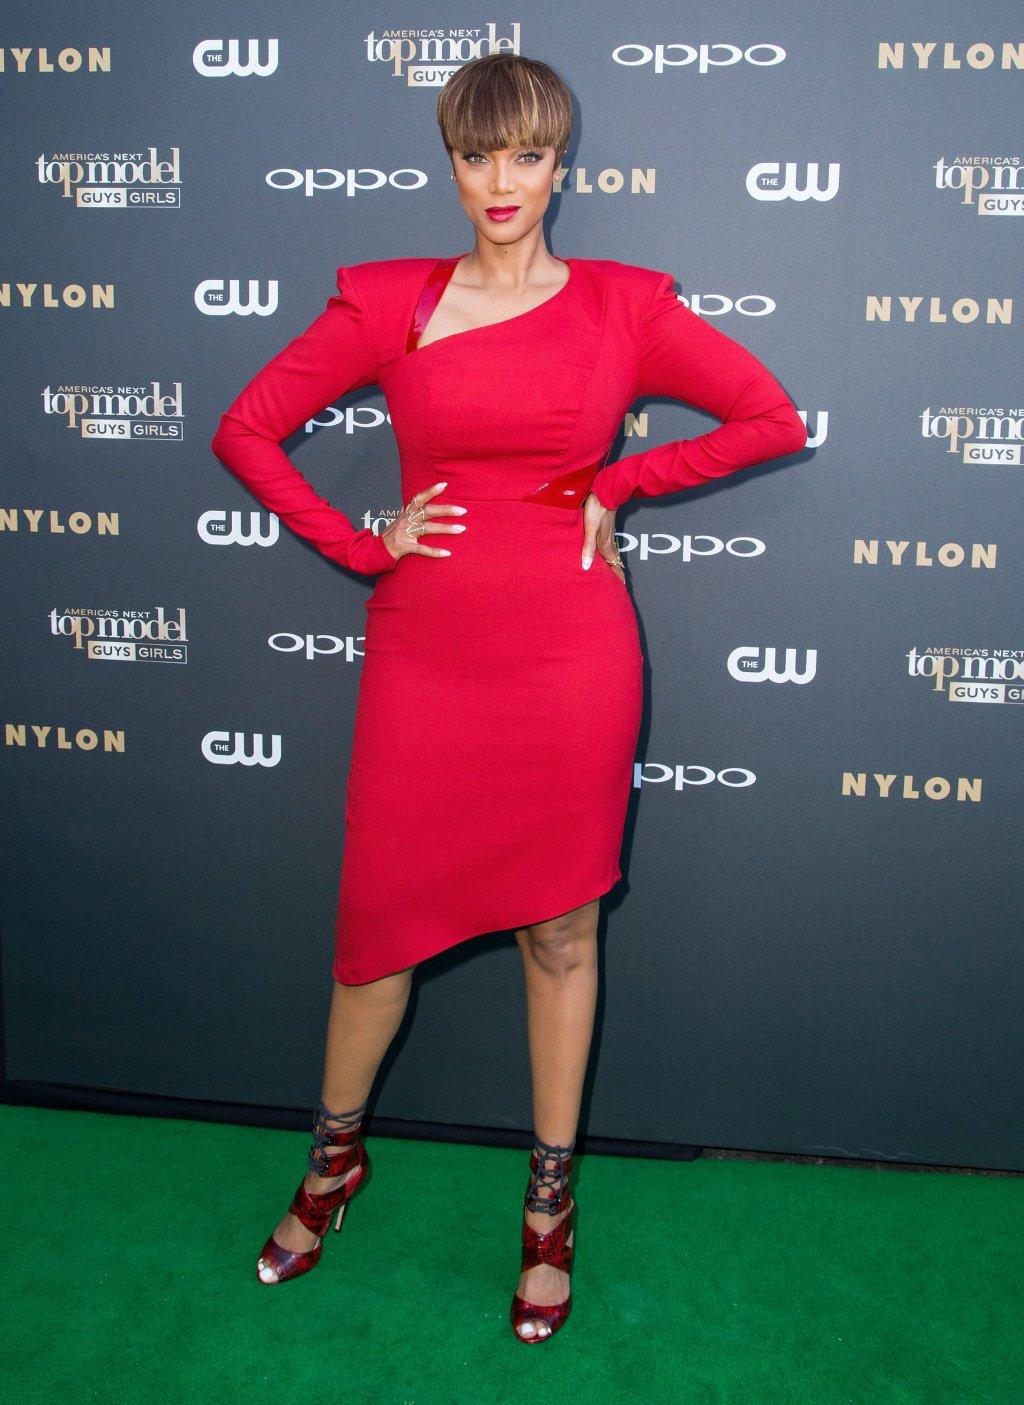 How Tall Is Tyra Banks?